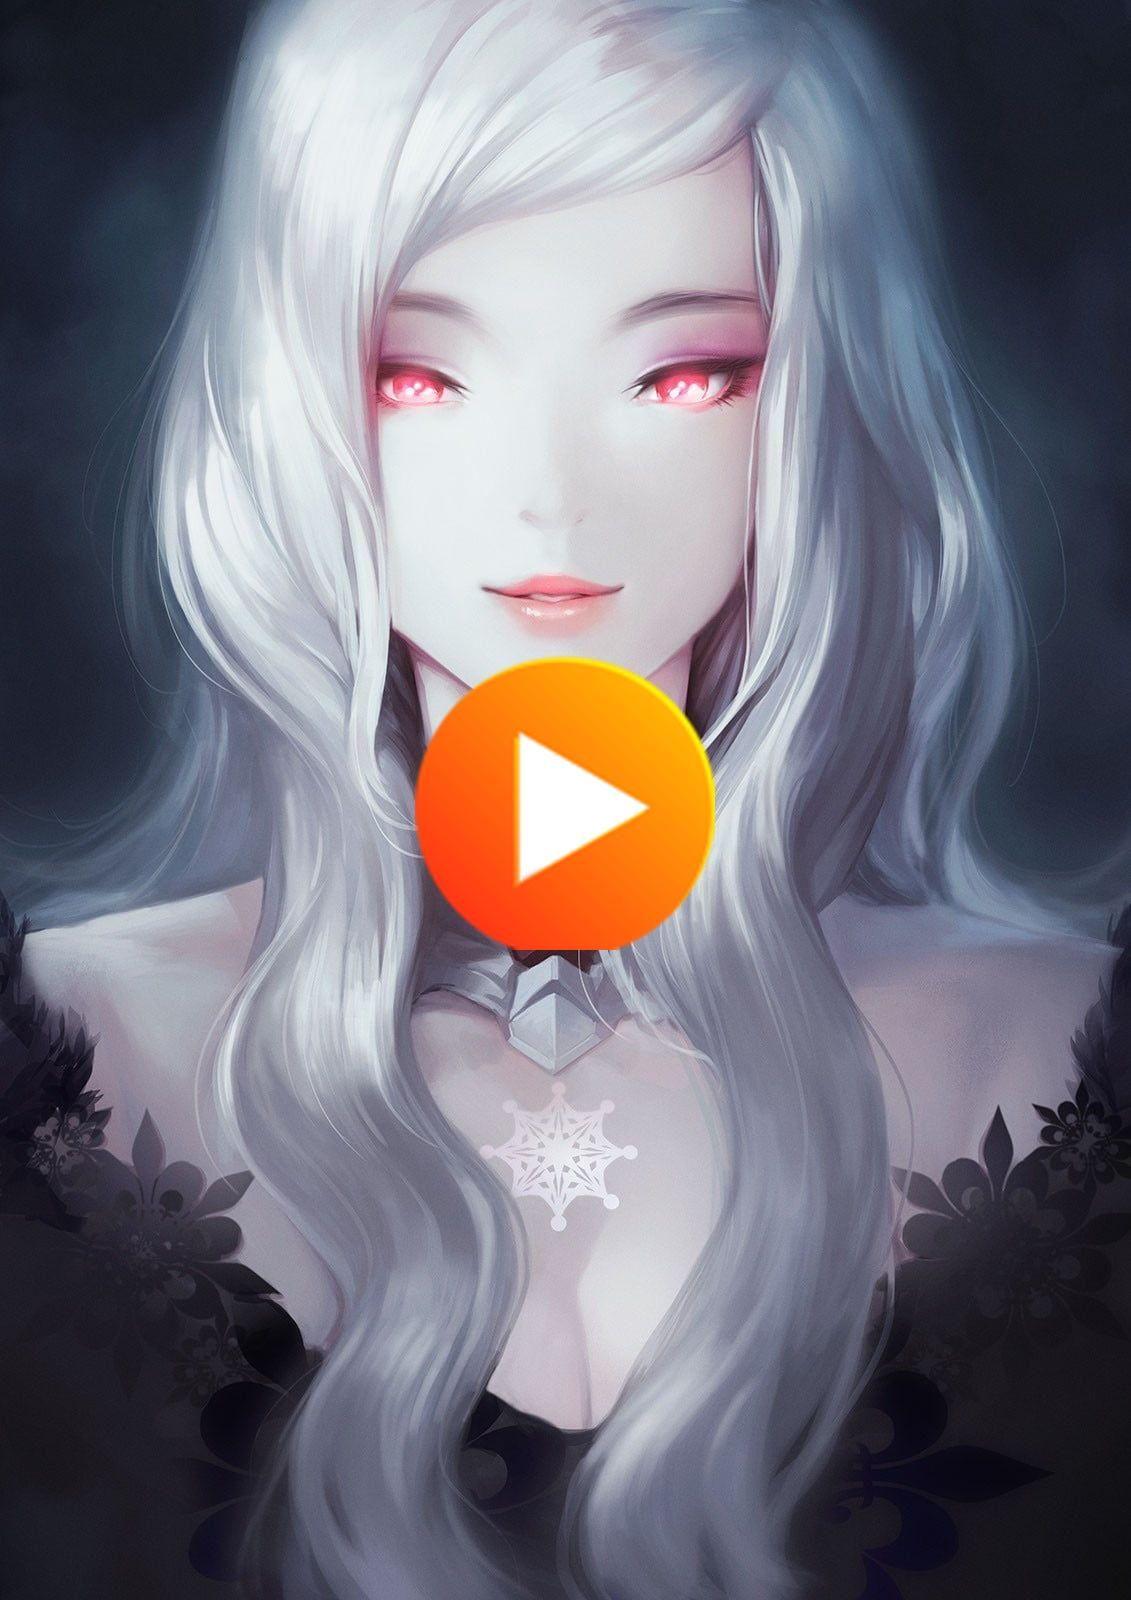 720p Wallpaper Hdwallpaper Desktop灰色の髪の女性アニメキャラクター赤い目白髪縦長の表示 In 2020 Anime Female Anime Anime Characters